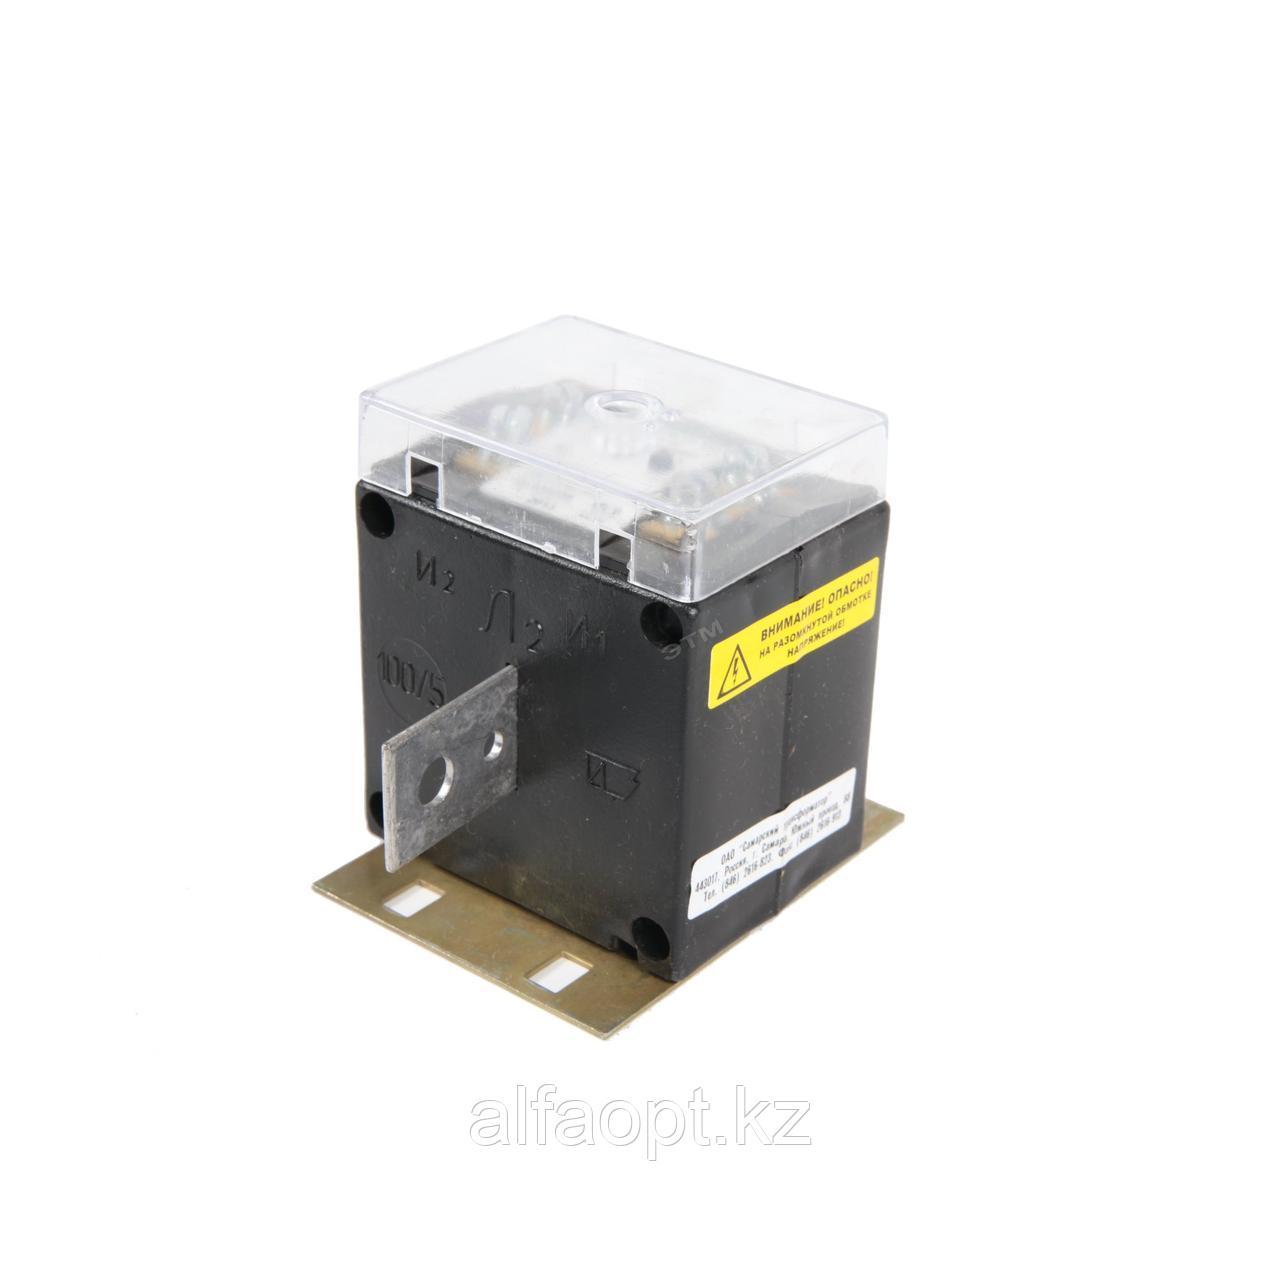 Трансформатор тока ТОП-0,66-5-0,5-200/5 У3